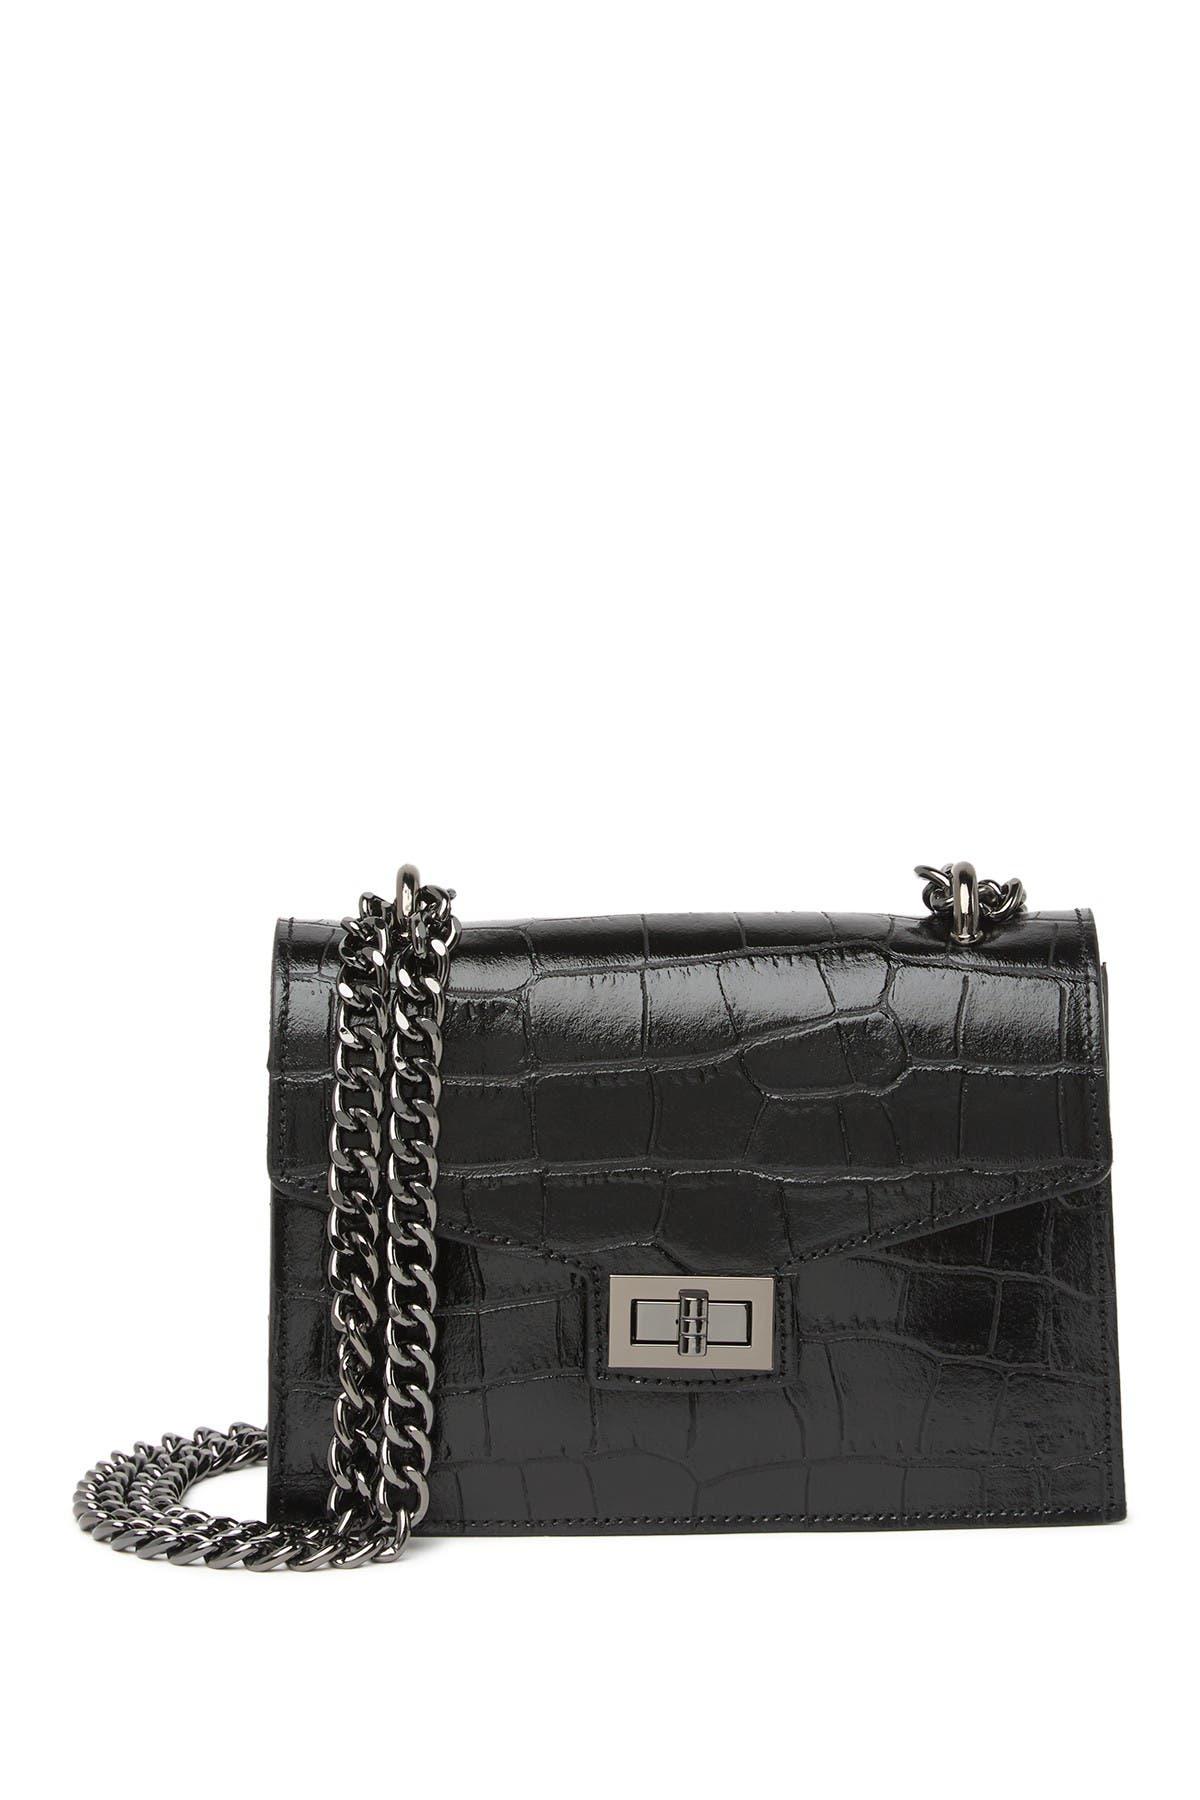 Image of Persaman New York Mathilde Embossed Leather Chain Strap Shoulder Bag